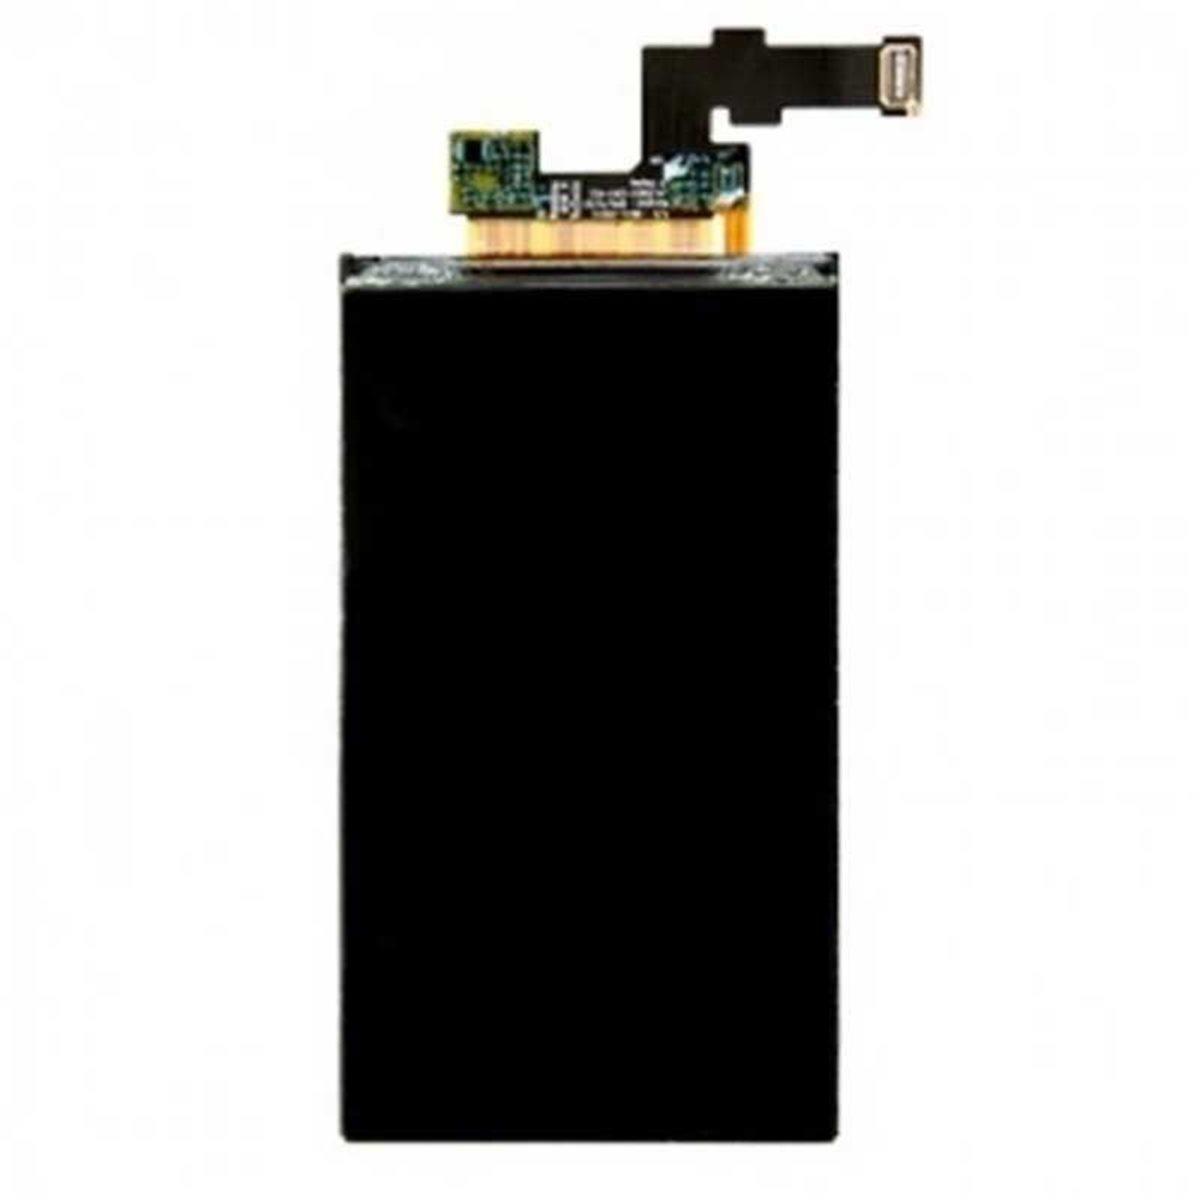 Pantalla LCD display LG Optimus L7 P700